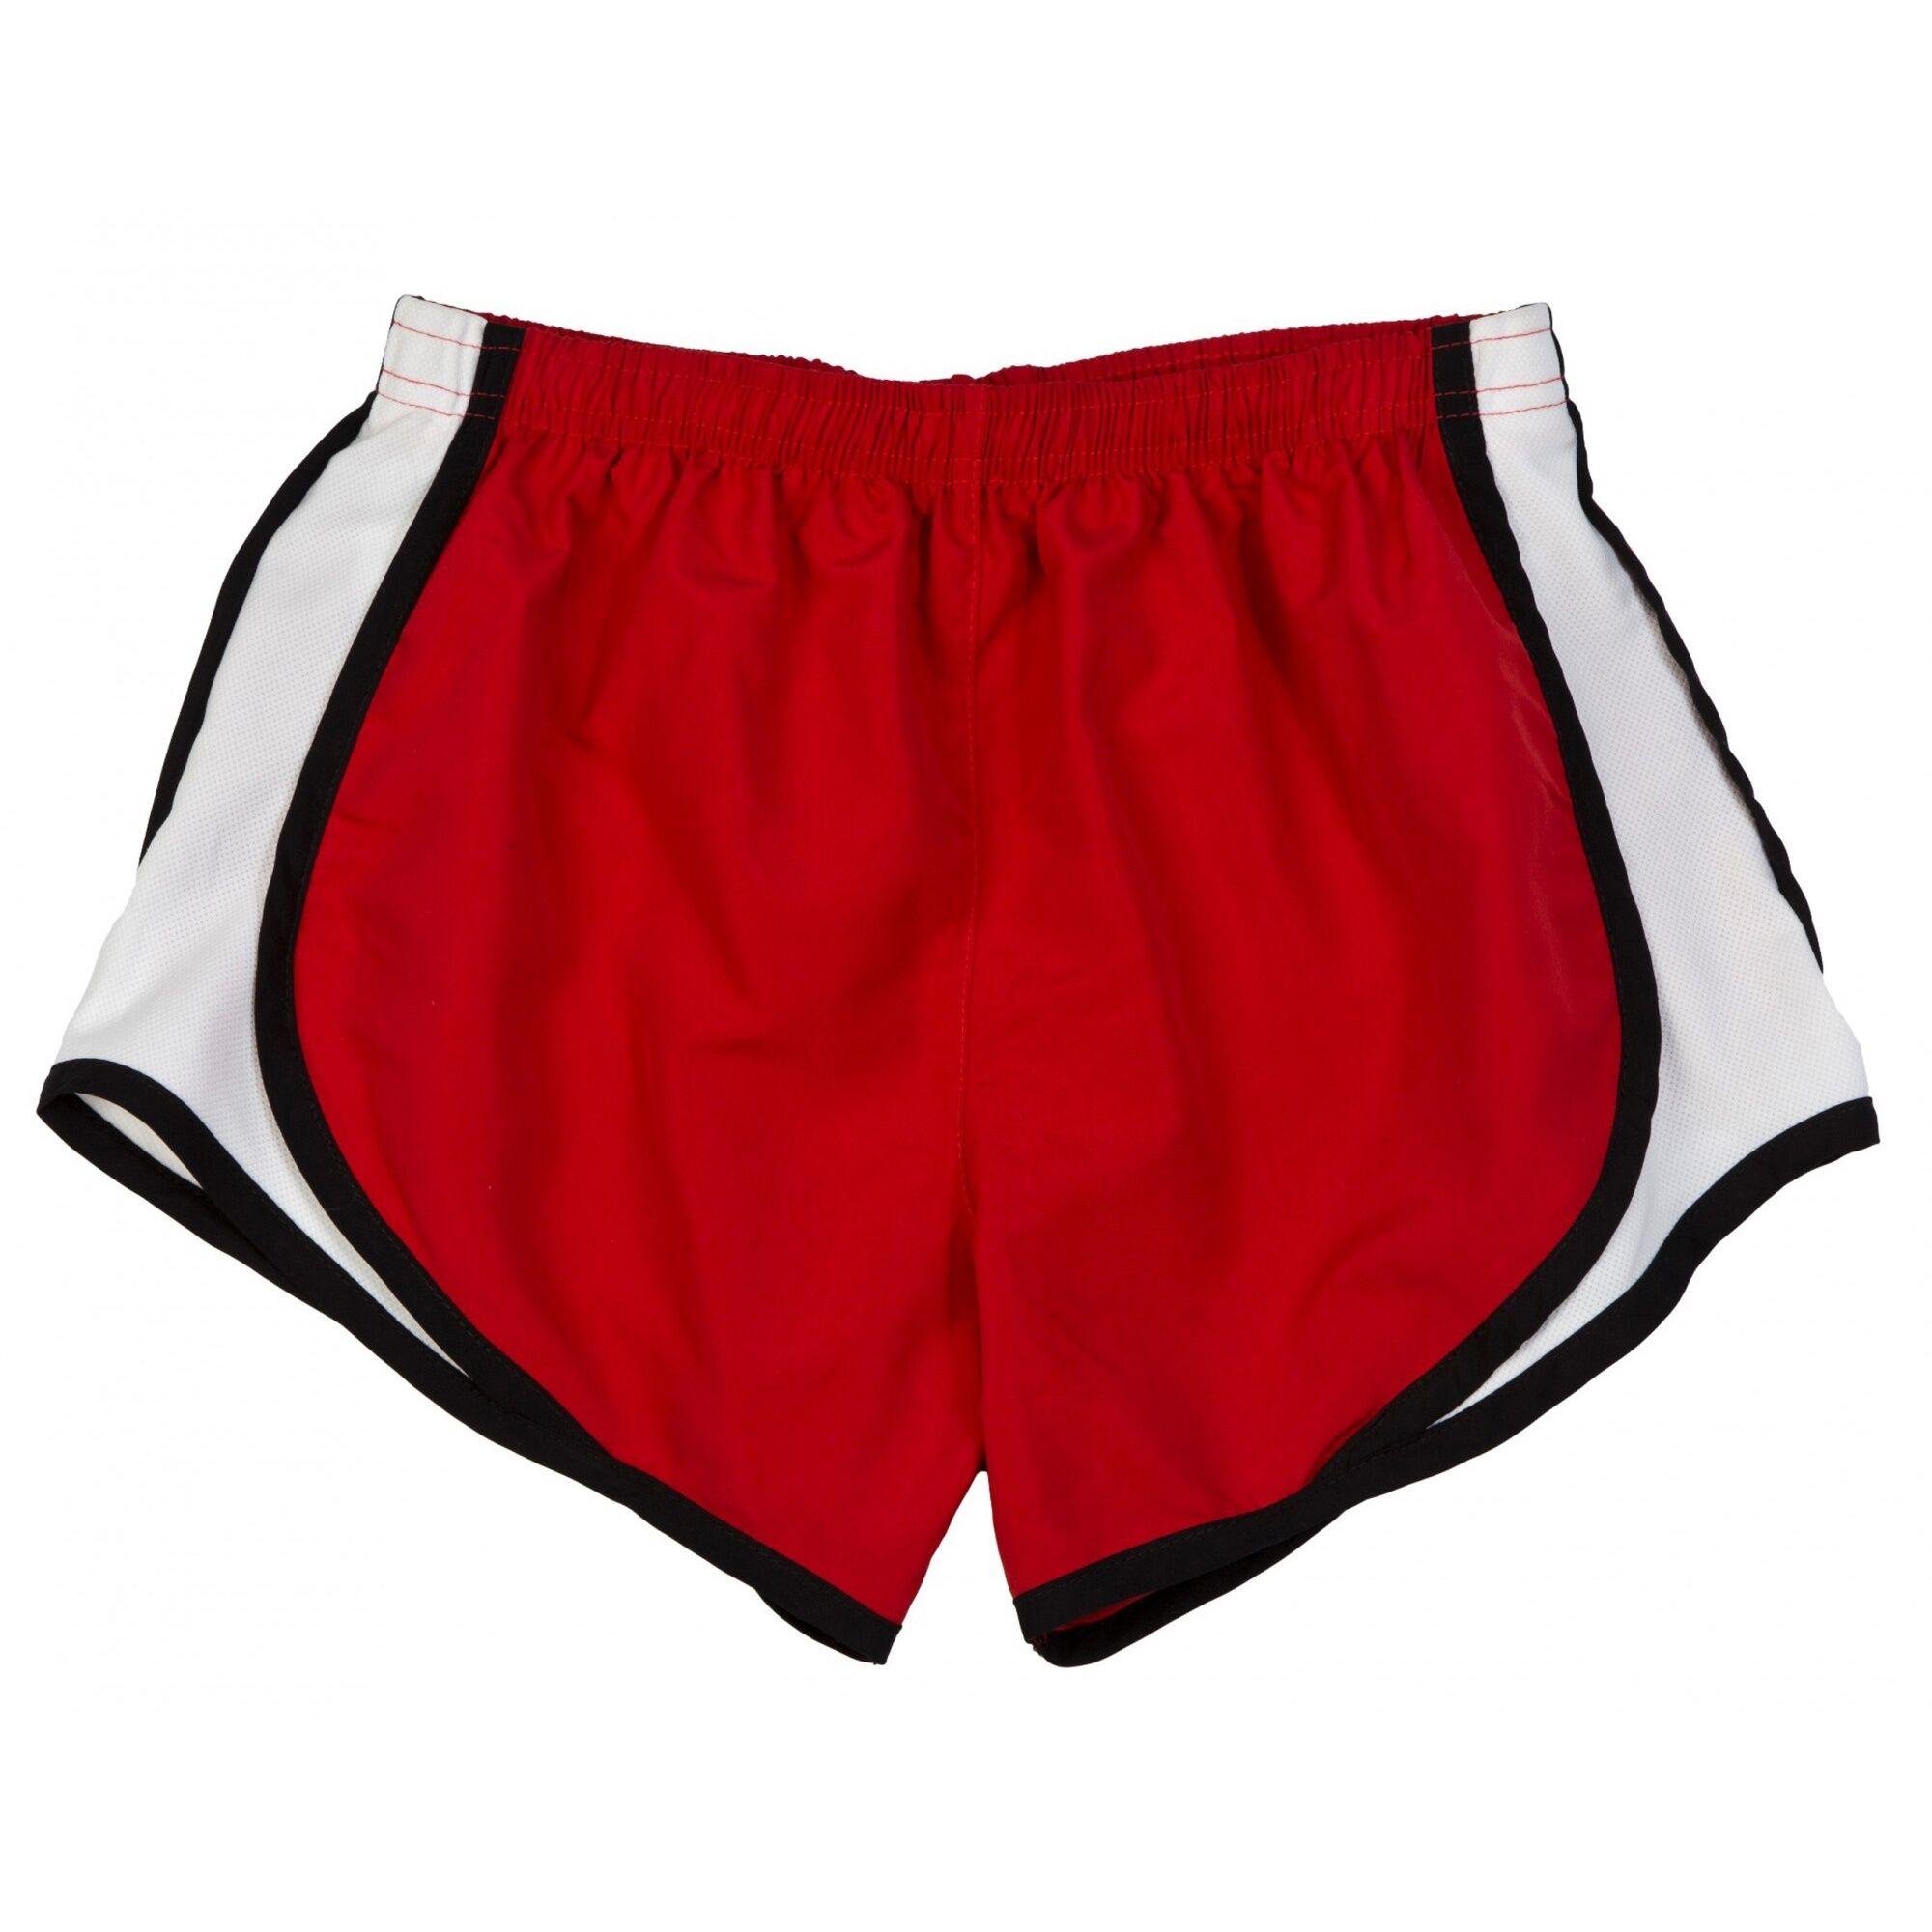 Boxercraft - Short De Sport Respirant - Femme (Rouge/Blanc) - UTRW2618